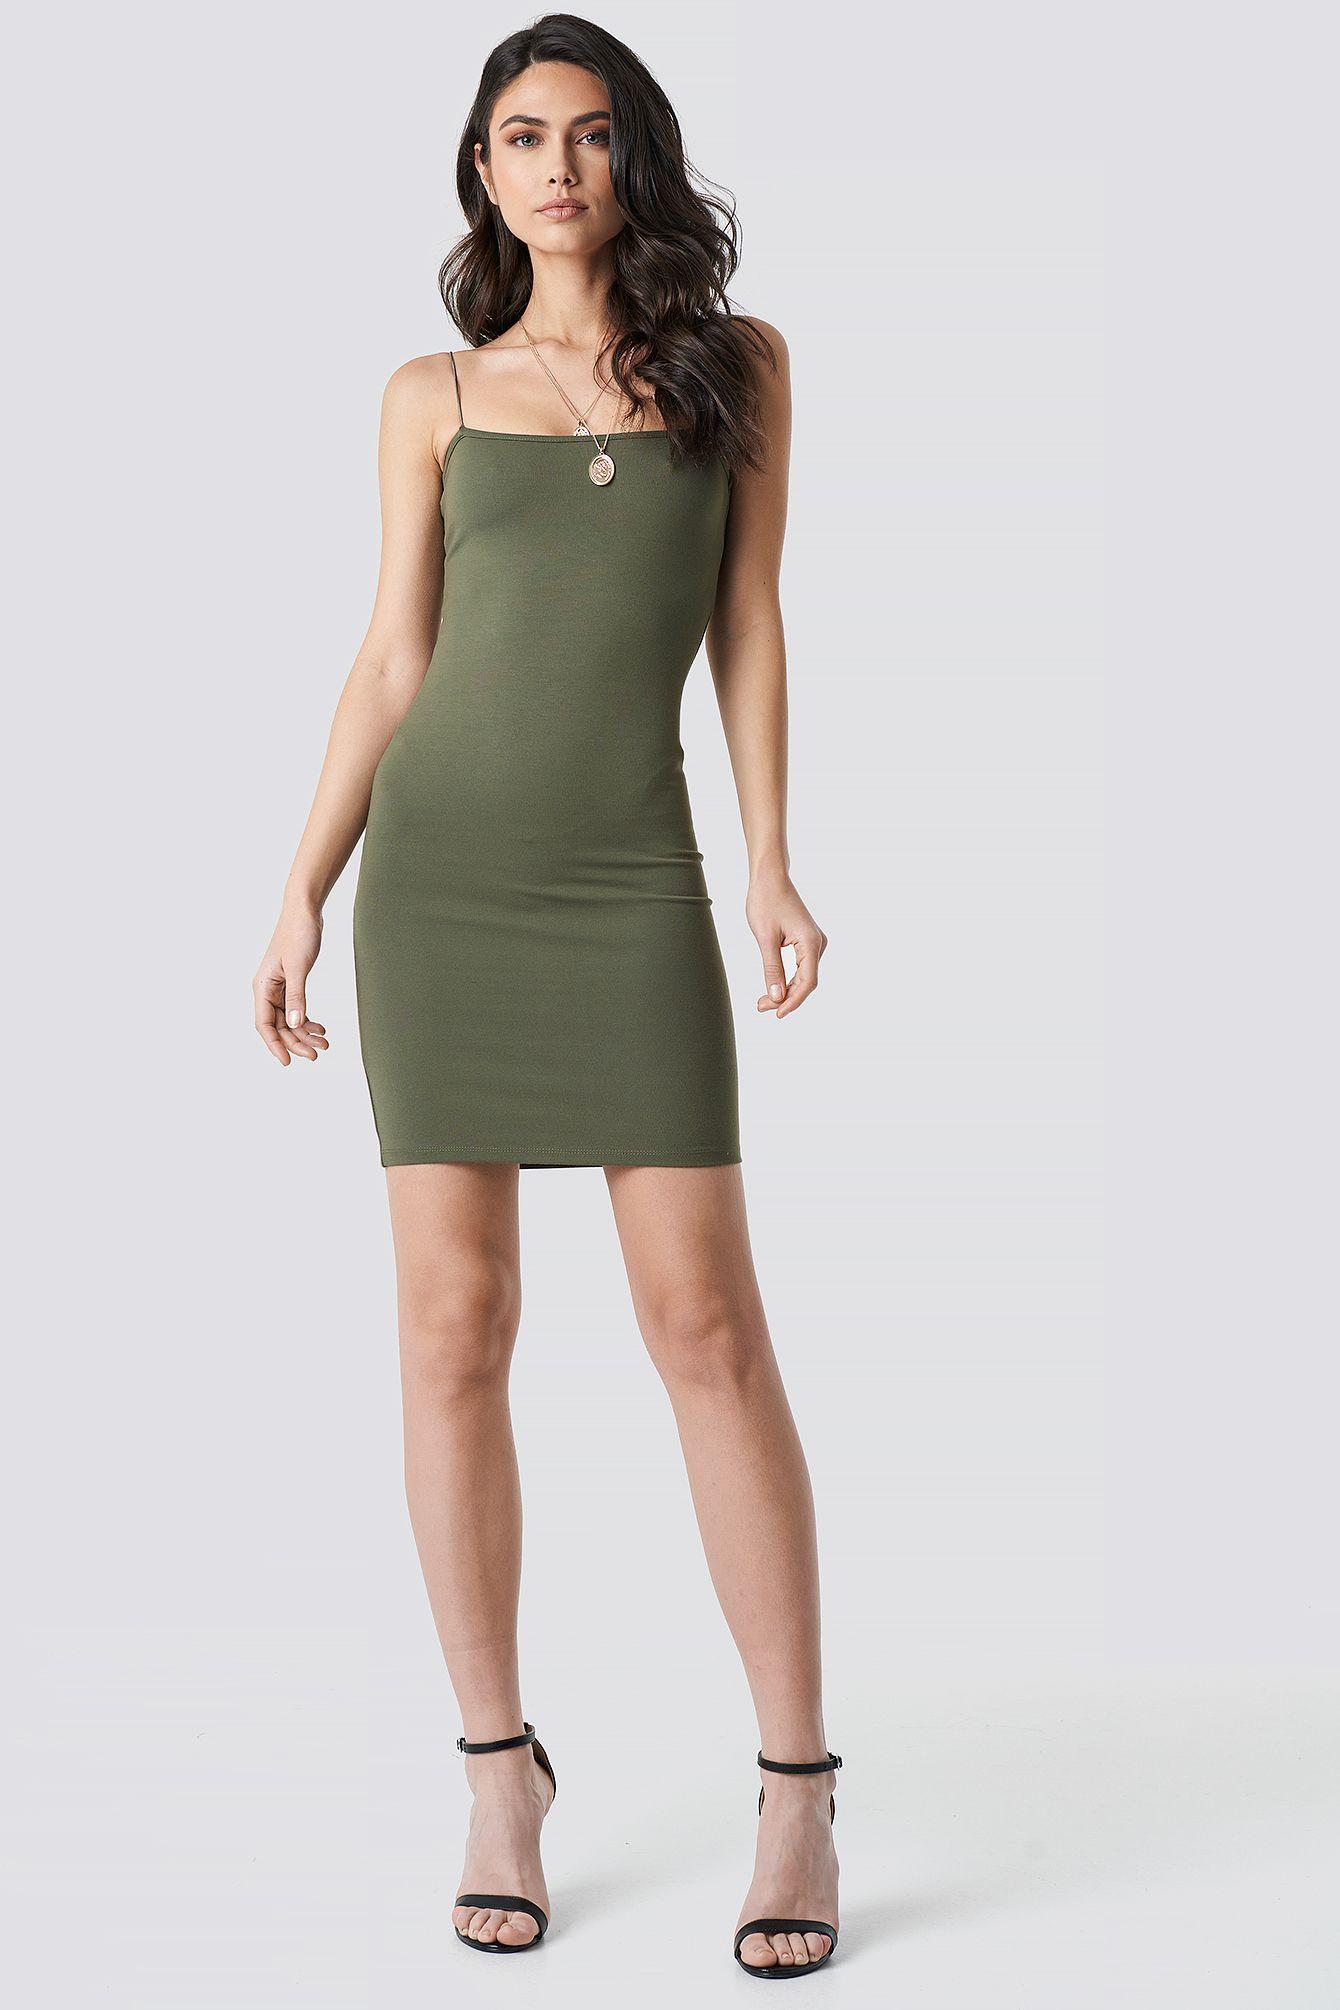 Spaghetti Strap Dress in 11  Kleider, Spaghetti, Party